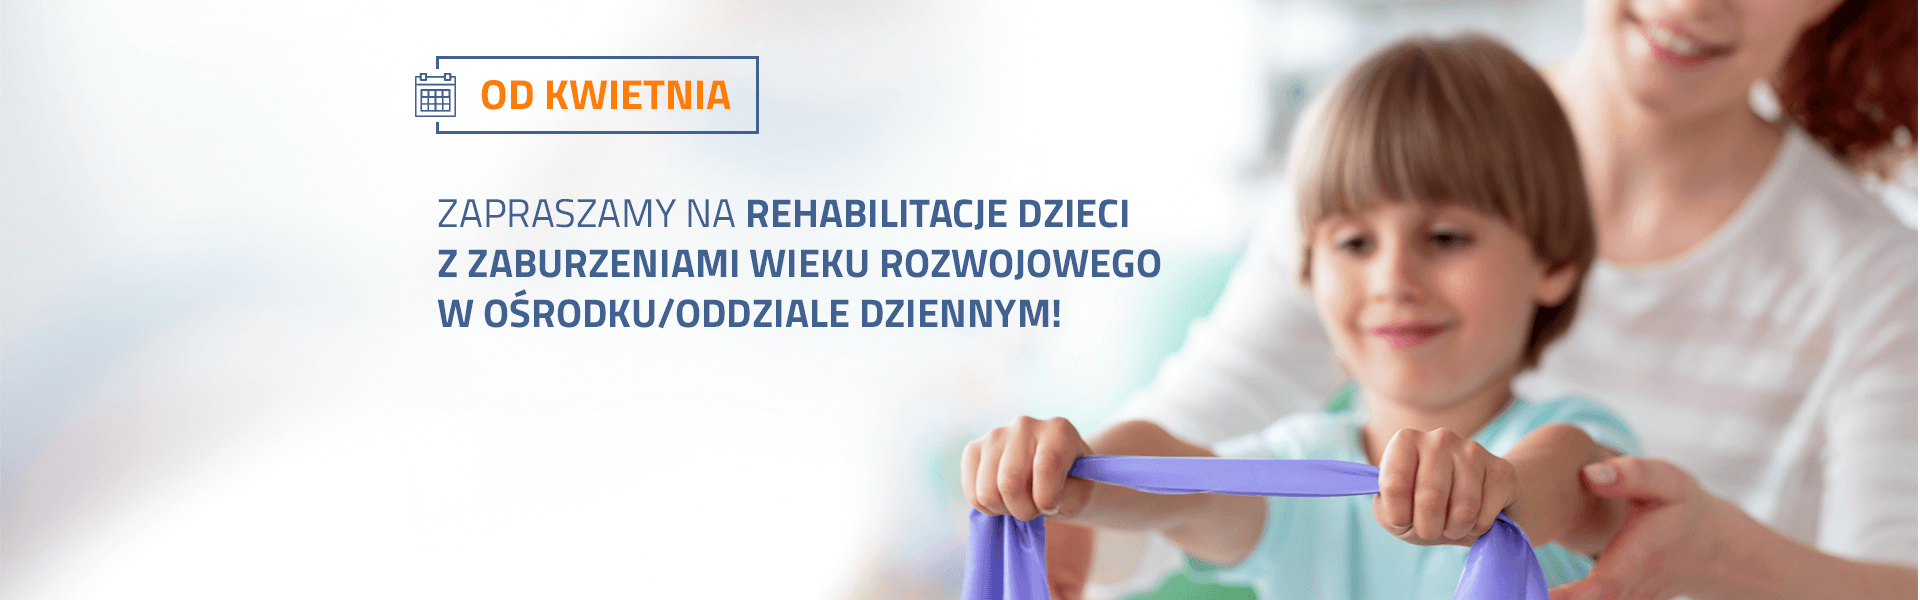 Medicamed rehabilitacje dzieci slider